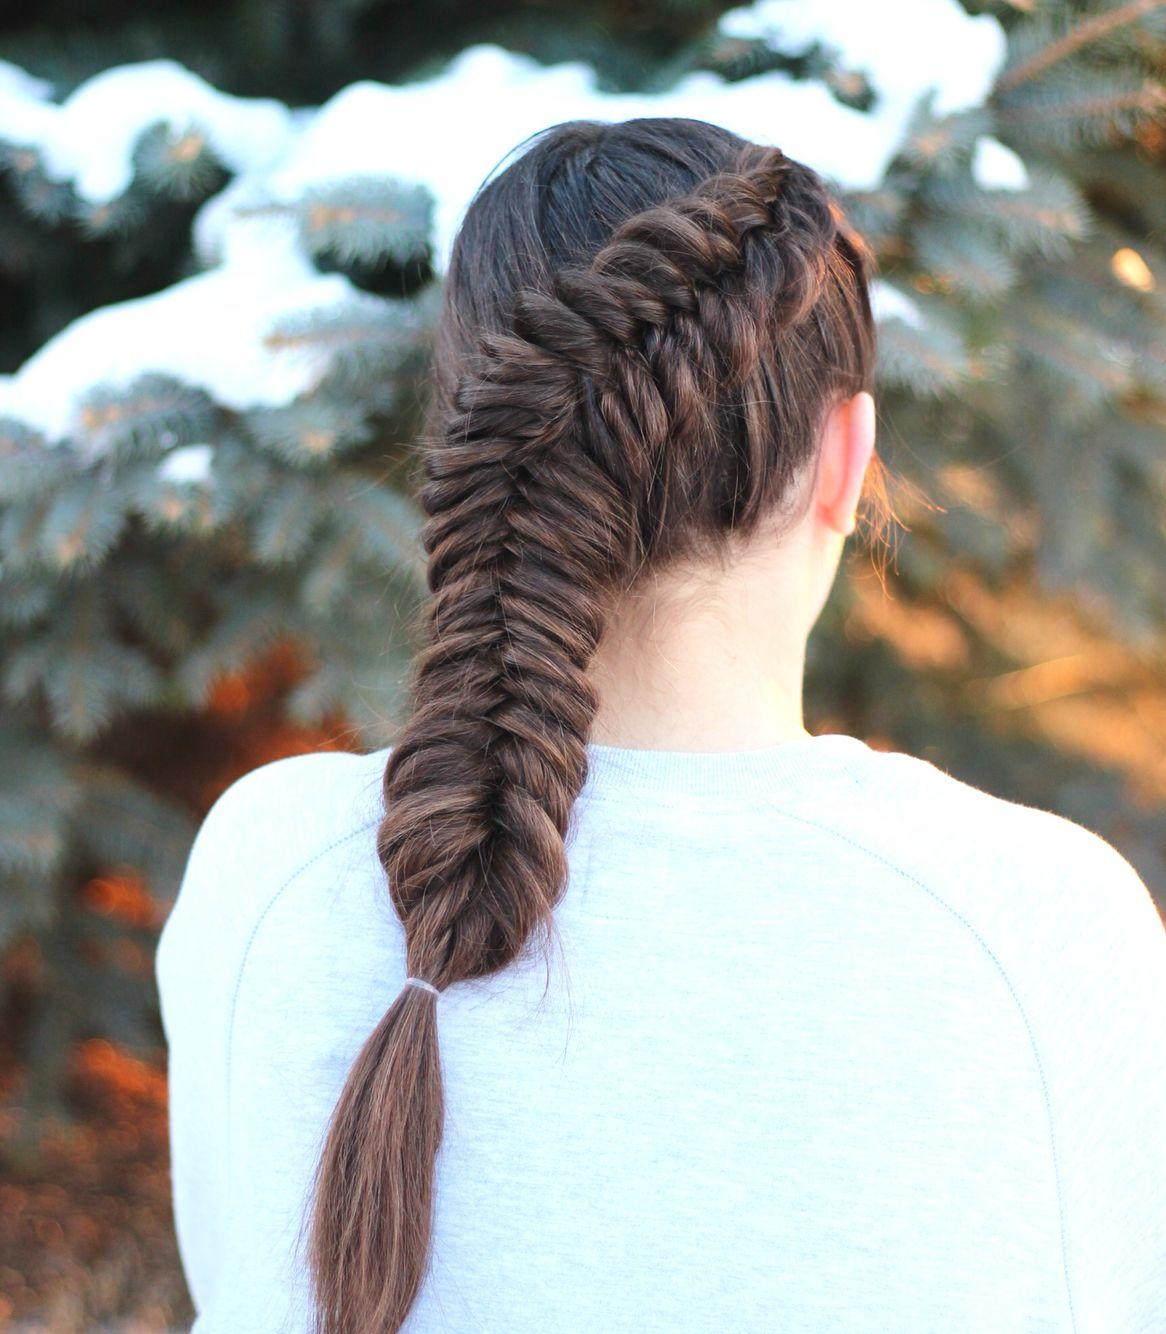 Dutch fishtail hannahhairstyles on instagram hannah hairstyles